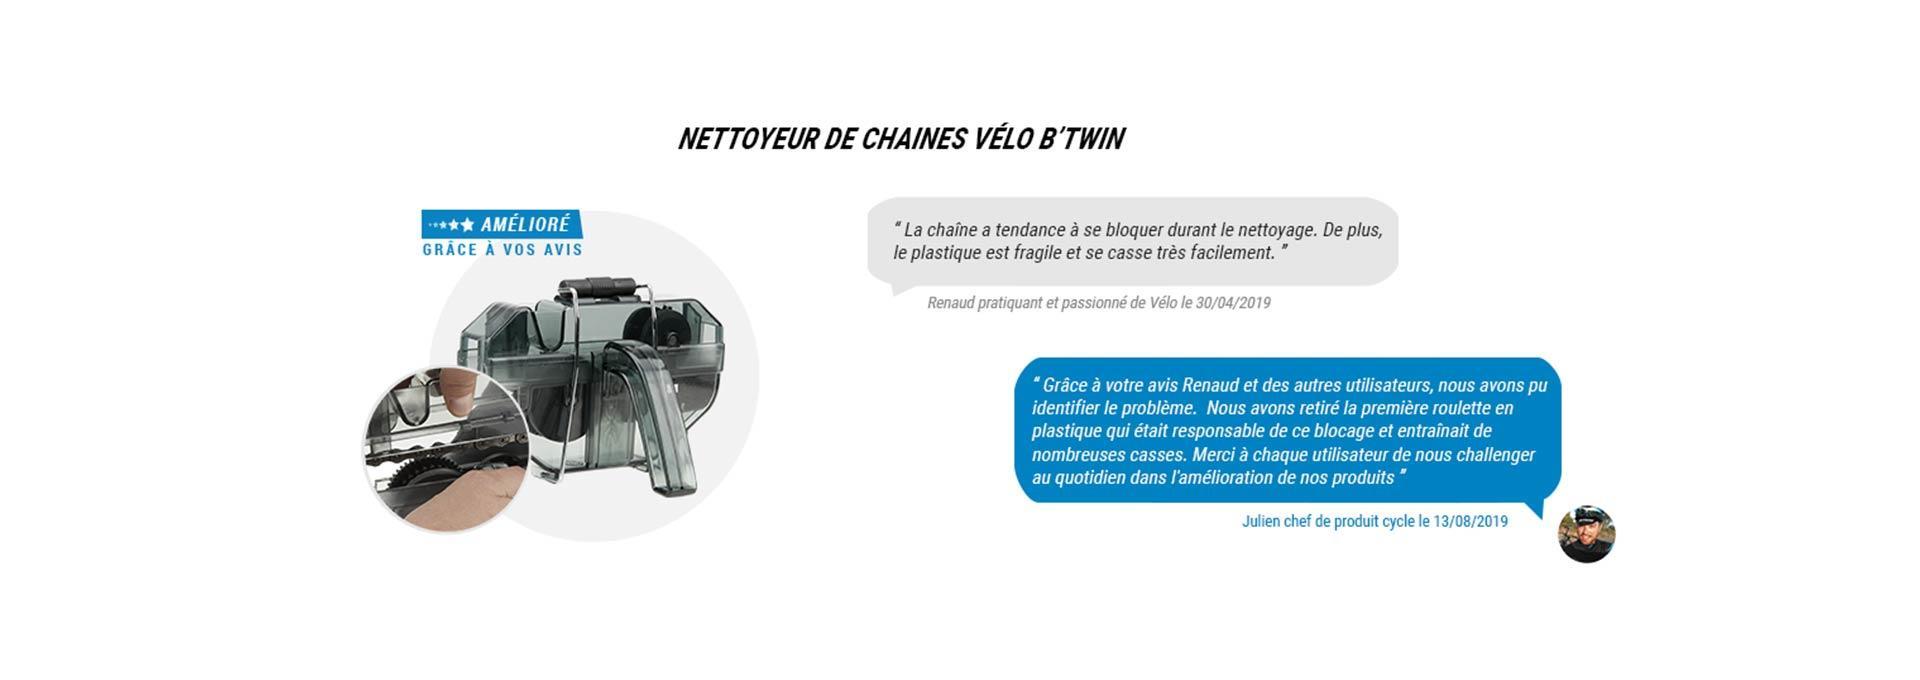 Nettoyeur de Chaine